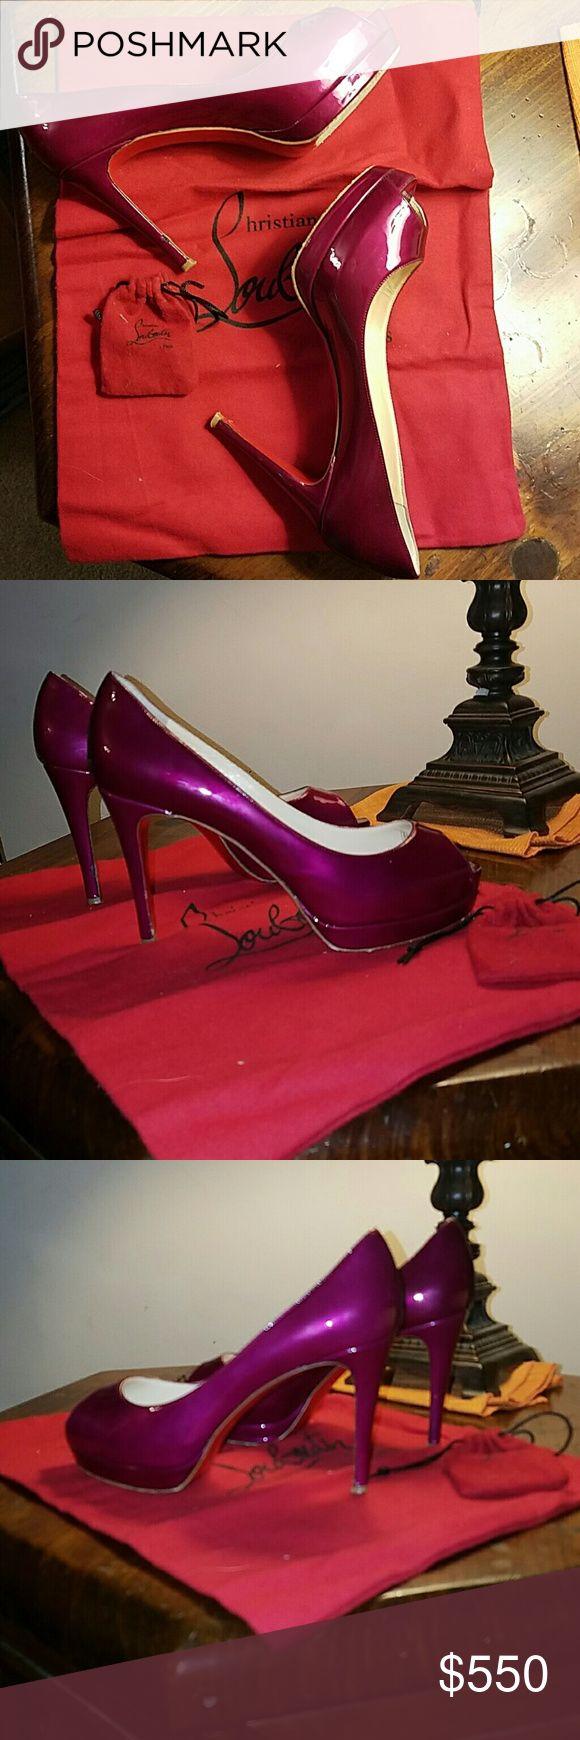 pink studded louboutins christian louboutin heels size 37